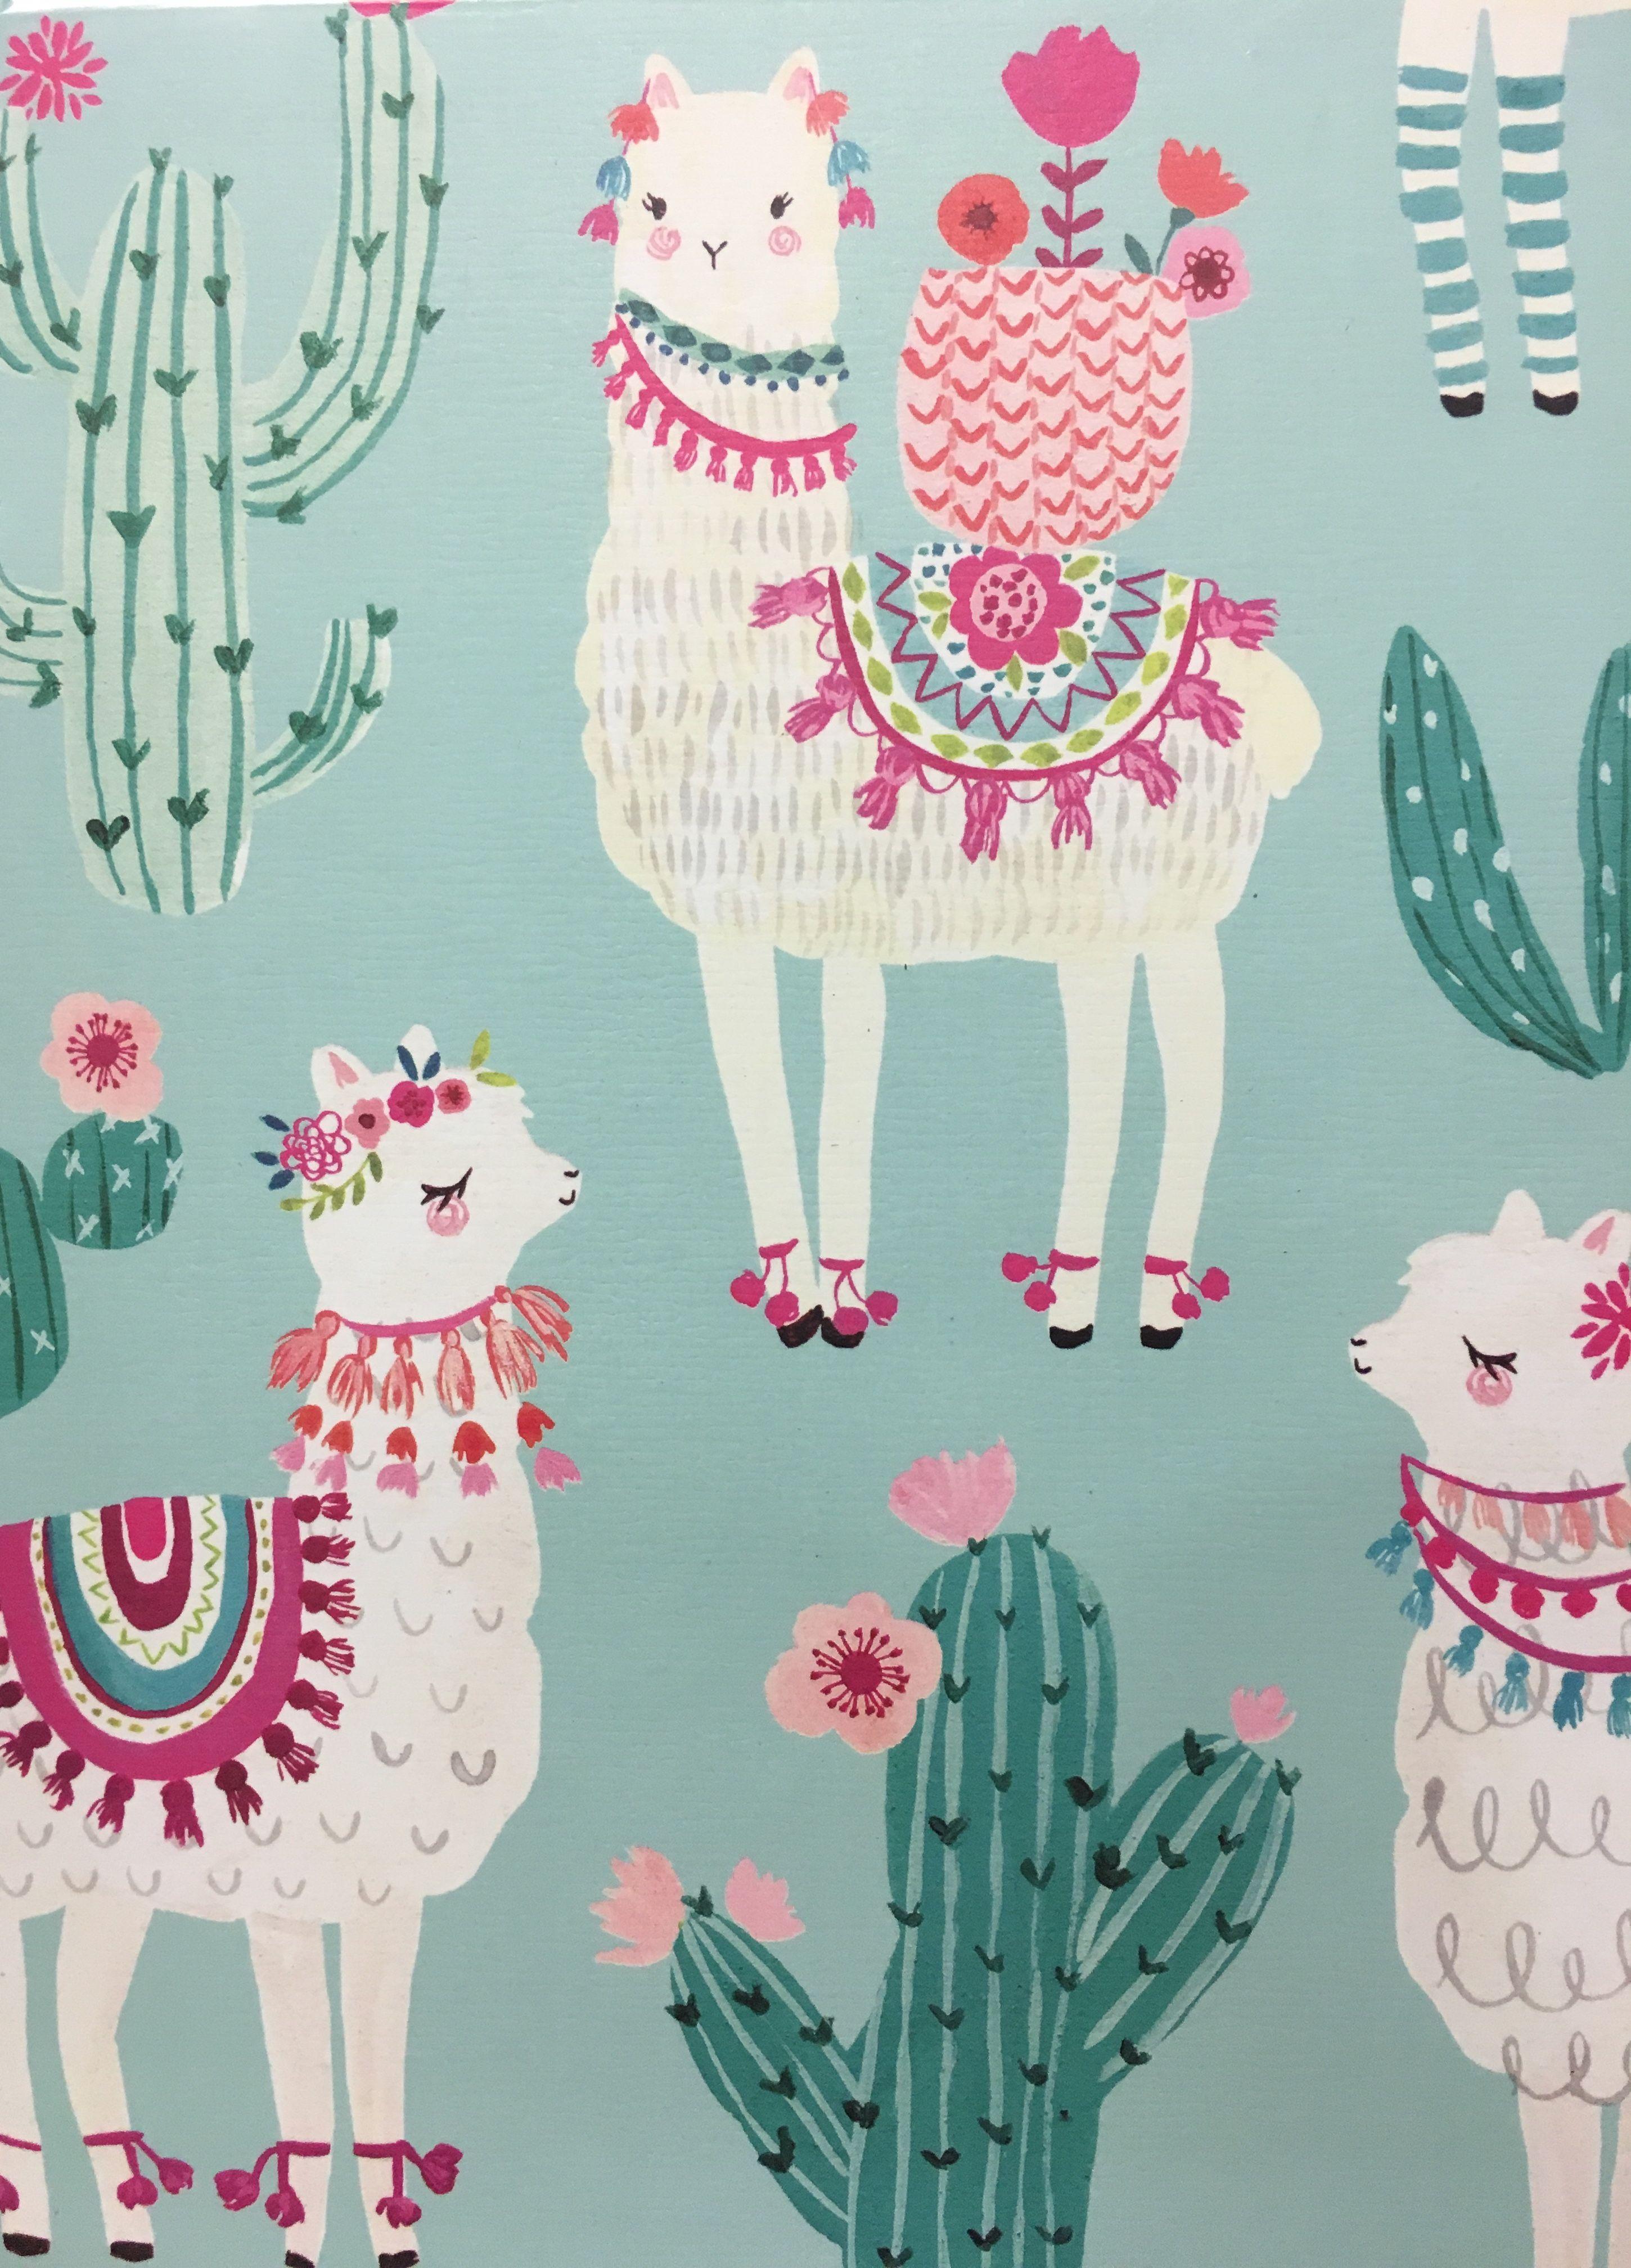 Sweety Llama Cute wallpapers, Iphone wallpaper, Wallpaper